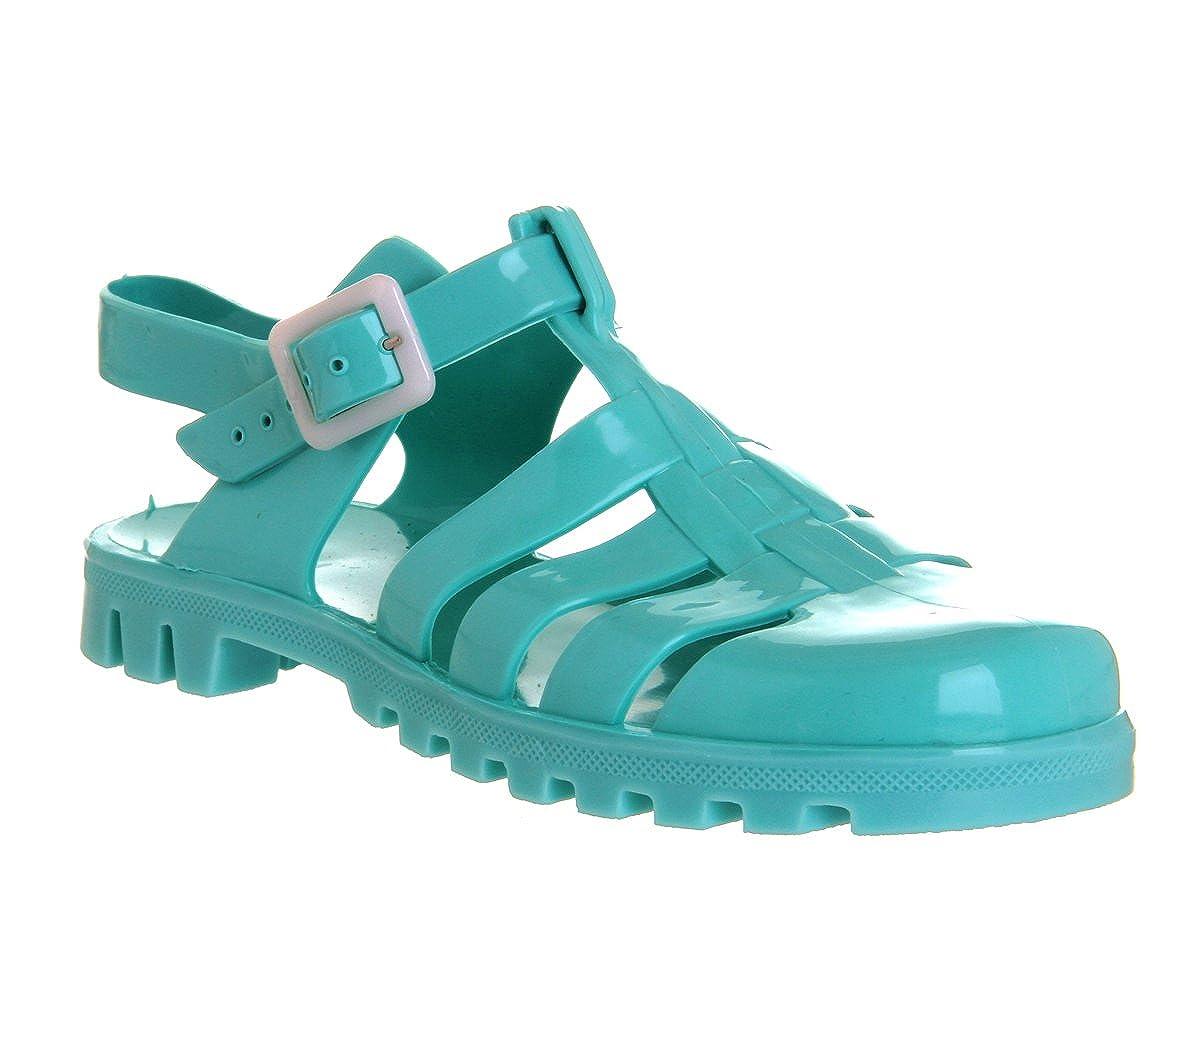 Black juju sandals - Black Juju Sandals 50